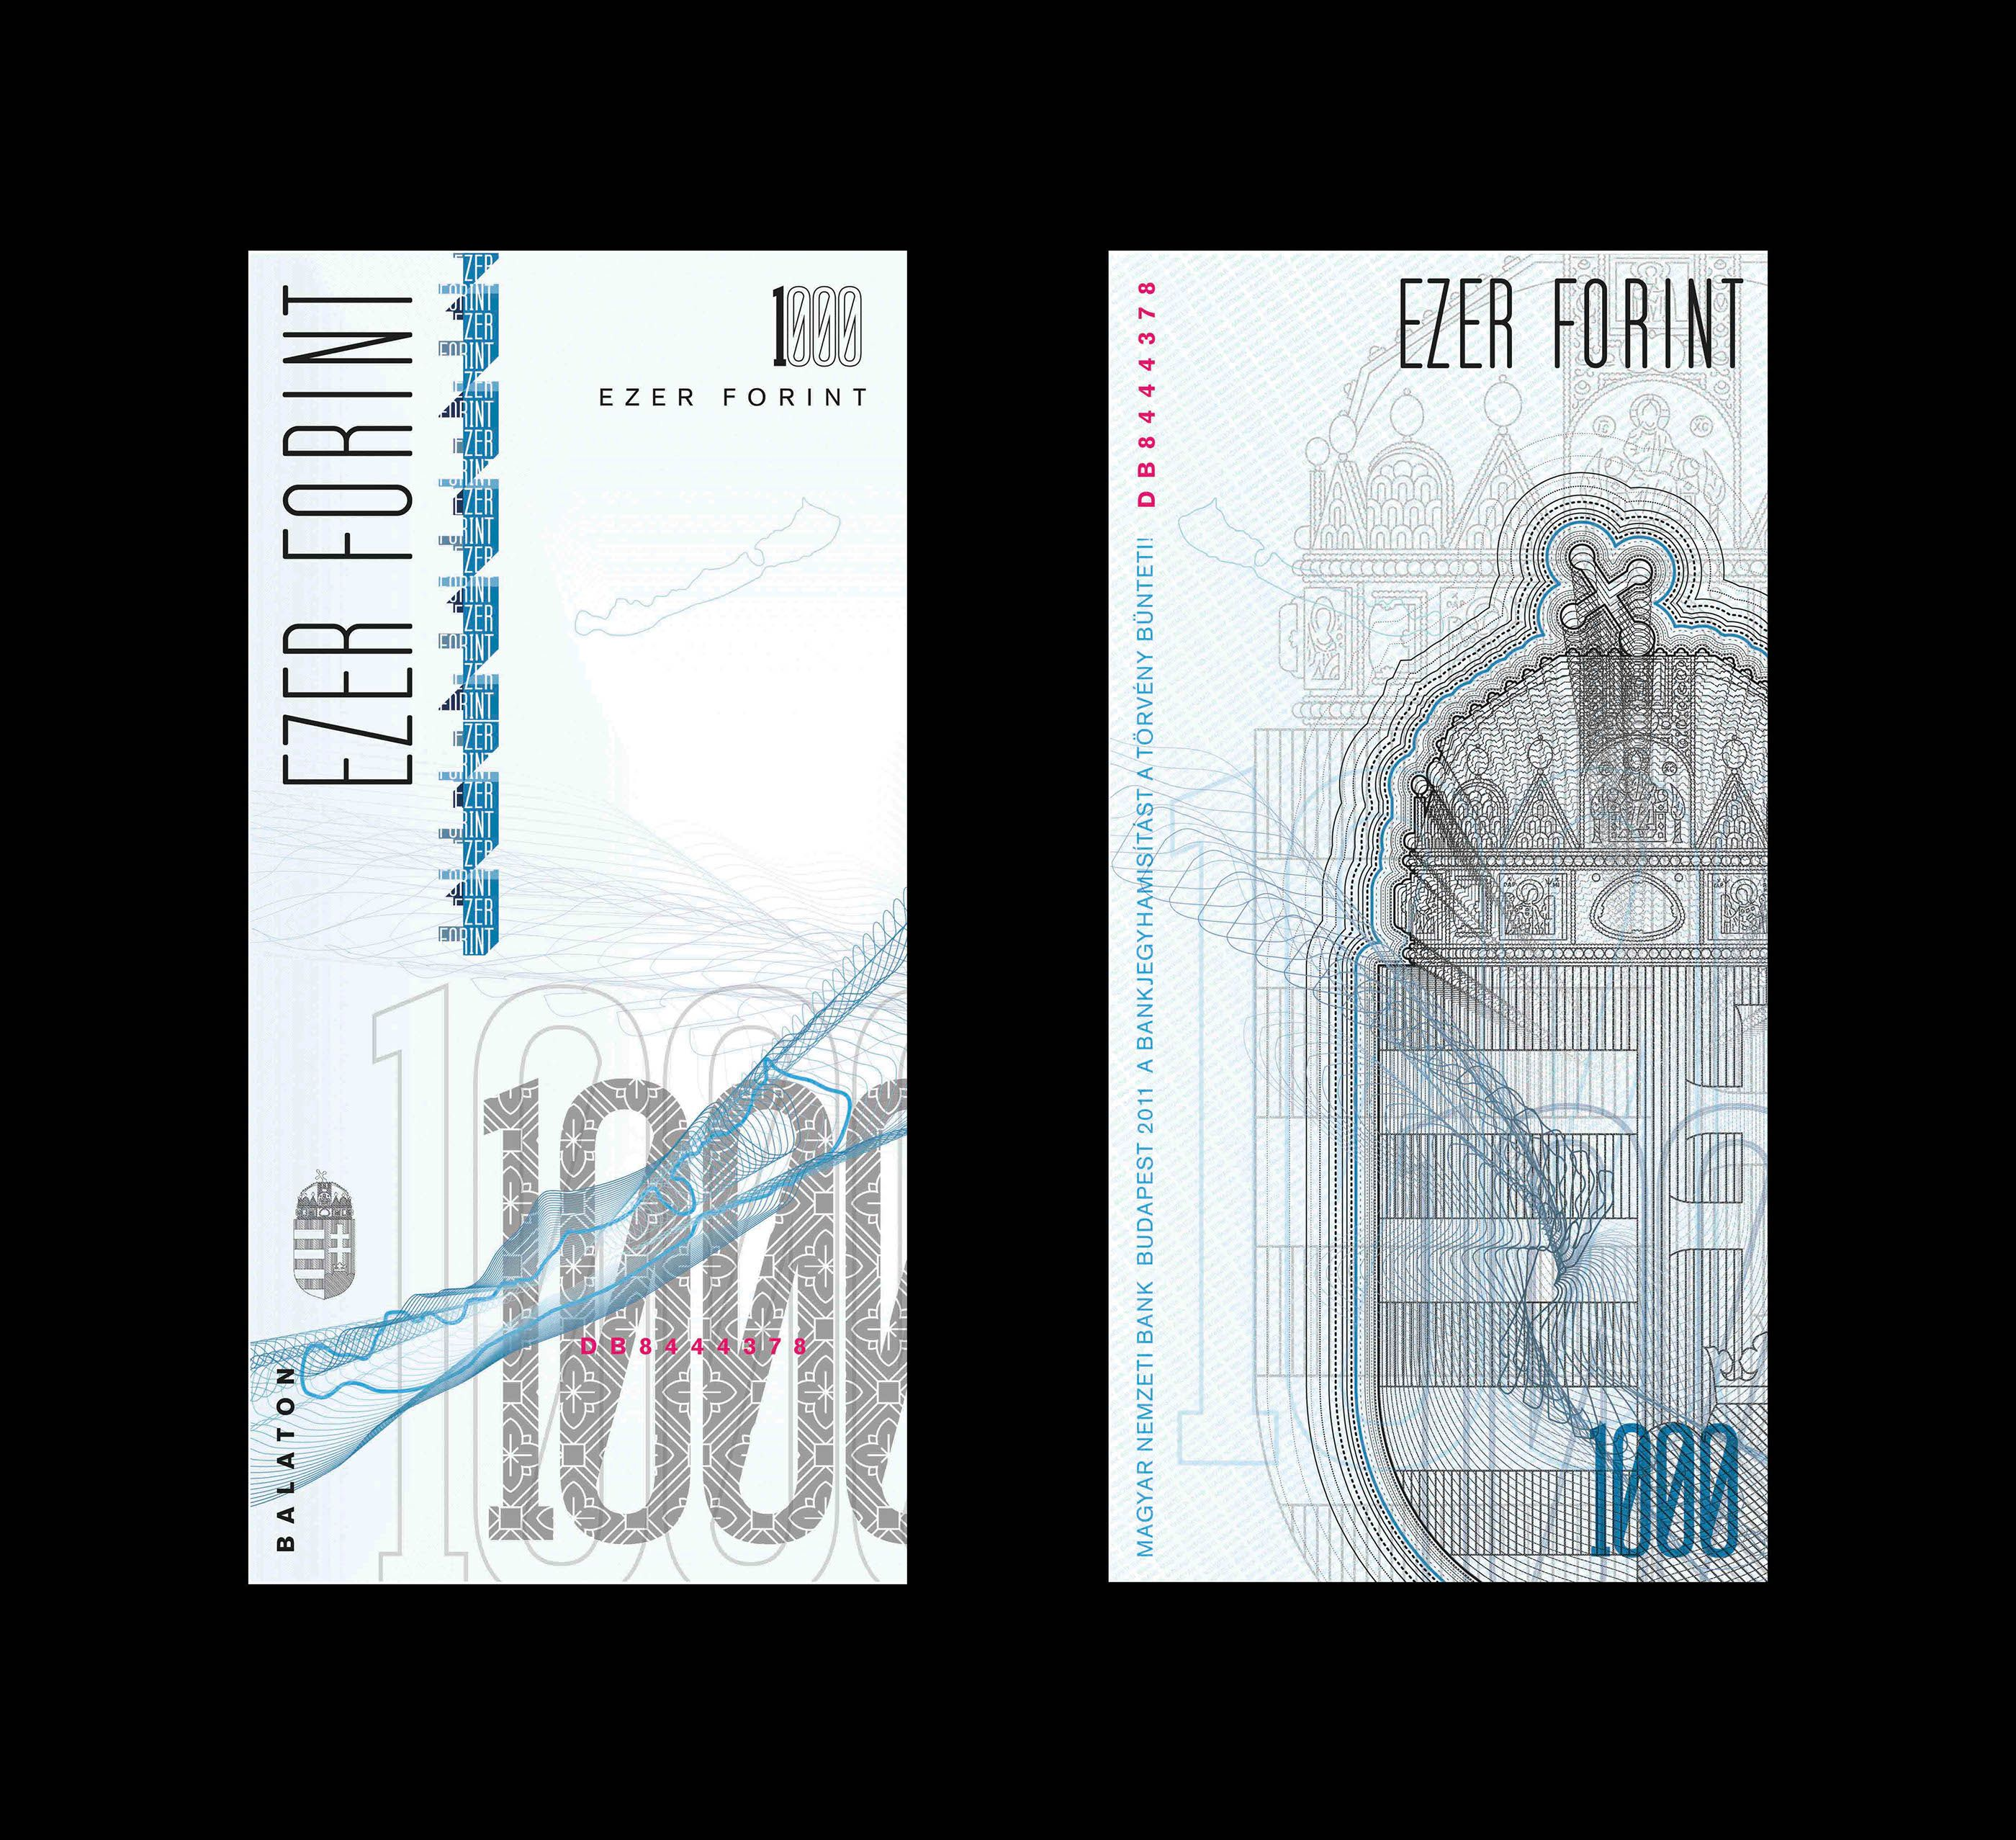 Pin De Graeme Thomson Em Banknotes Currency Com Imagens